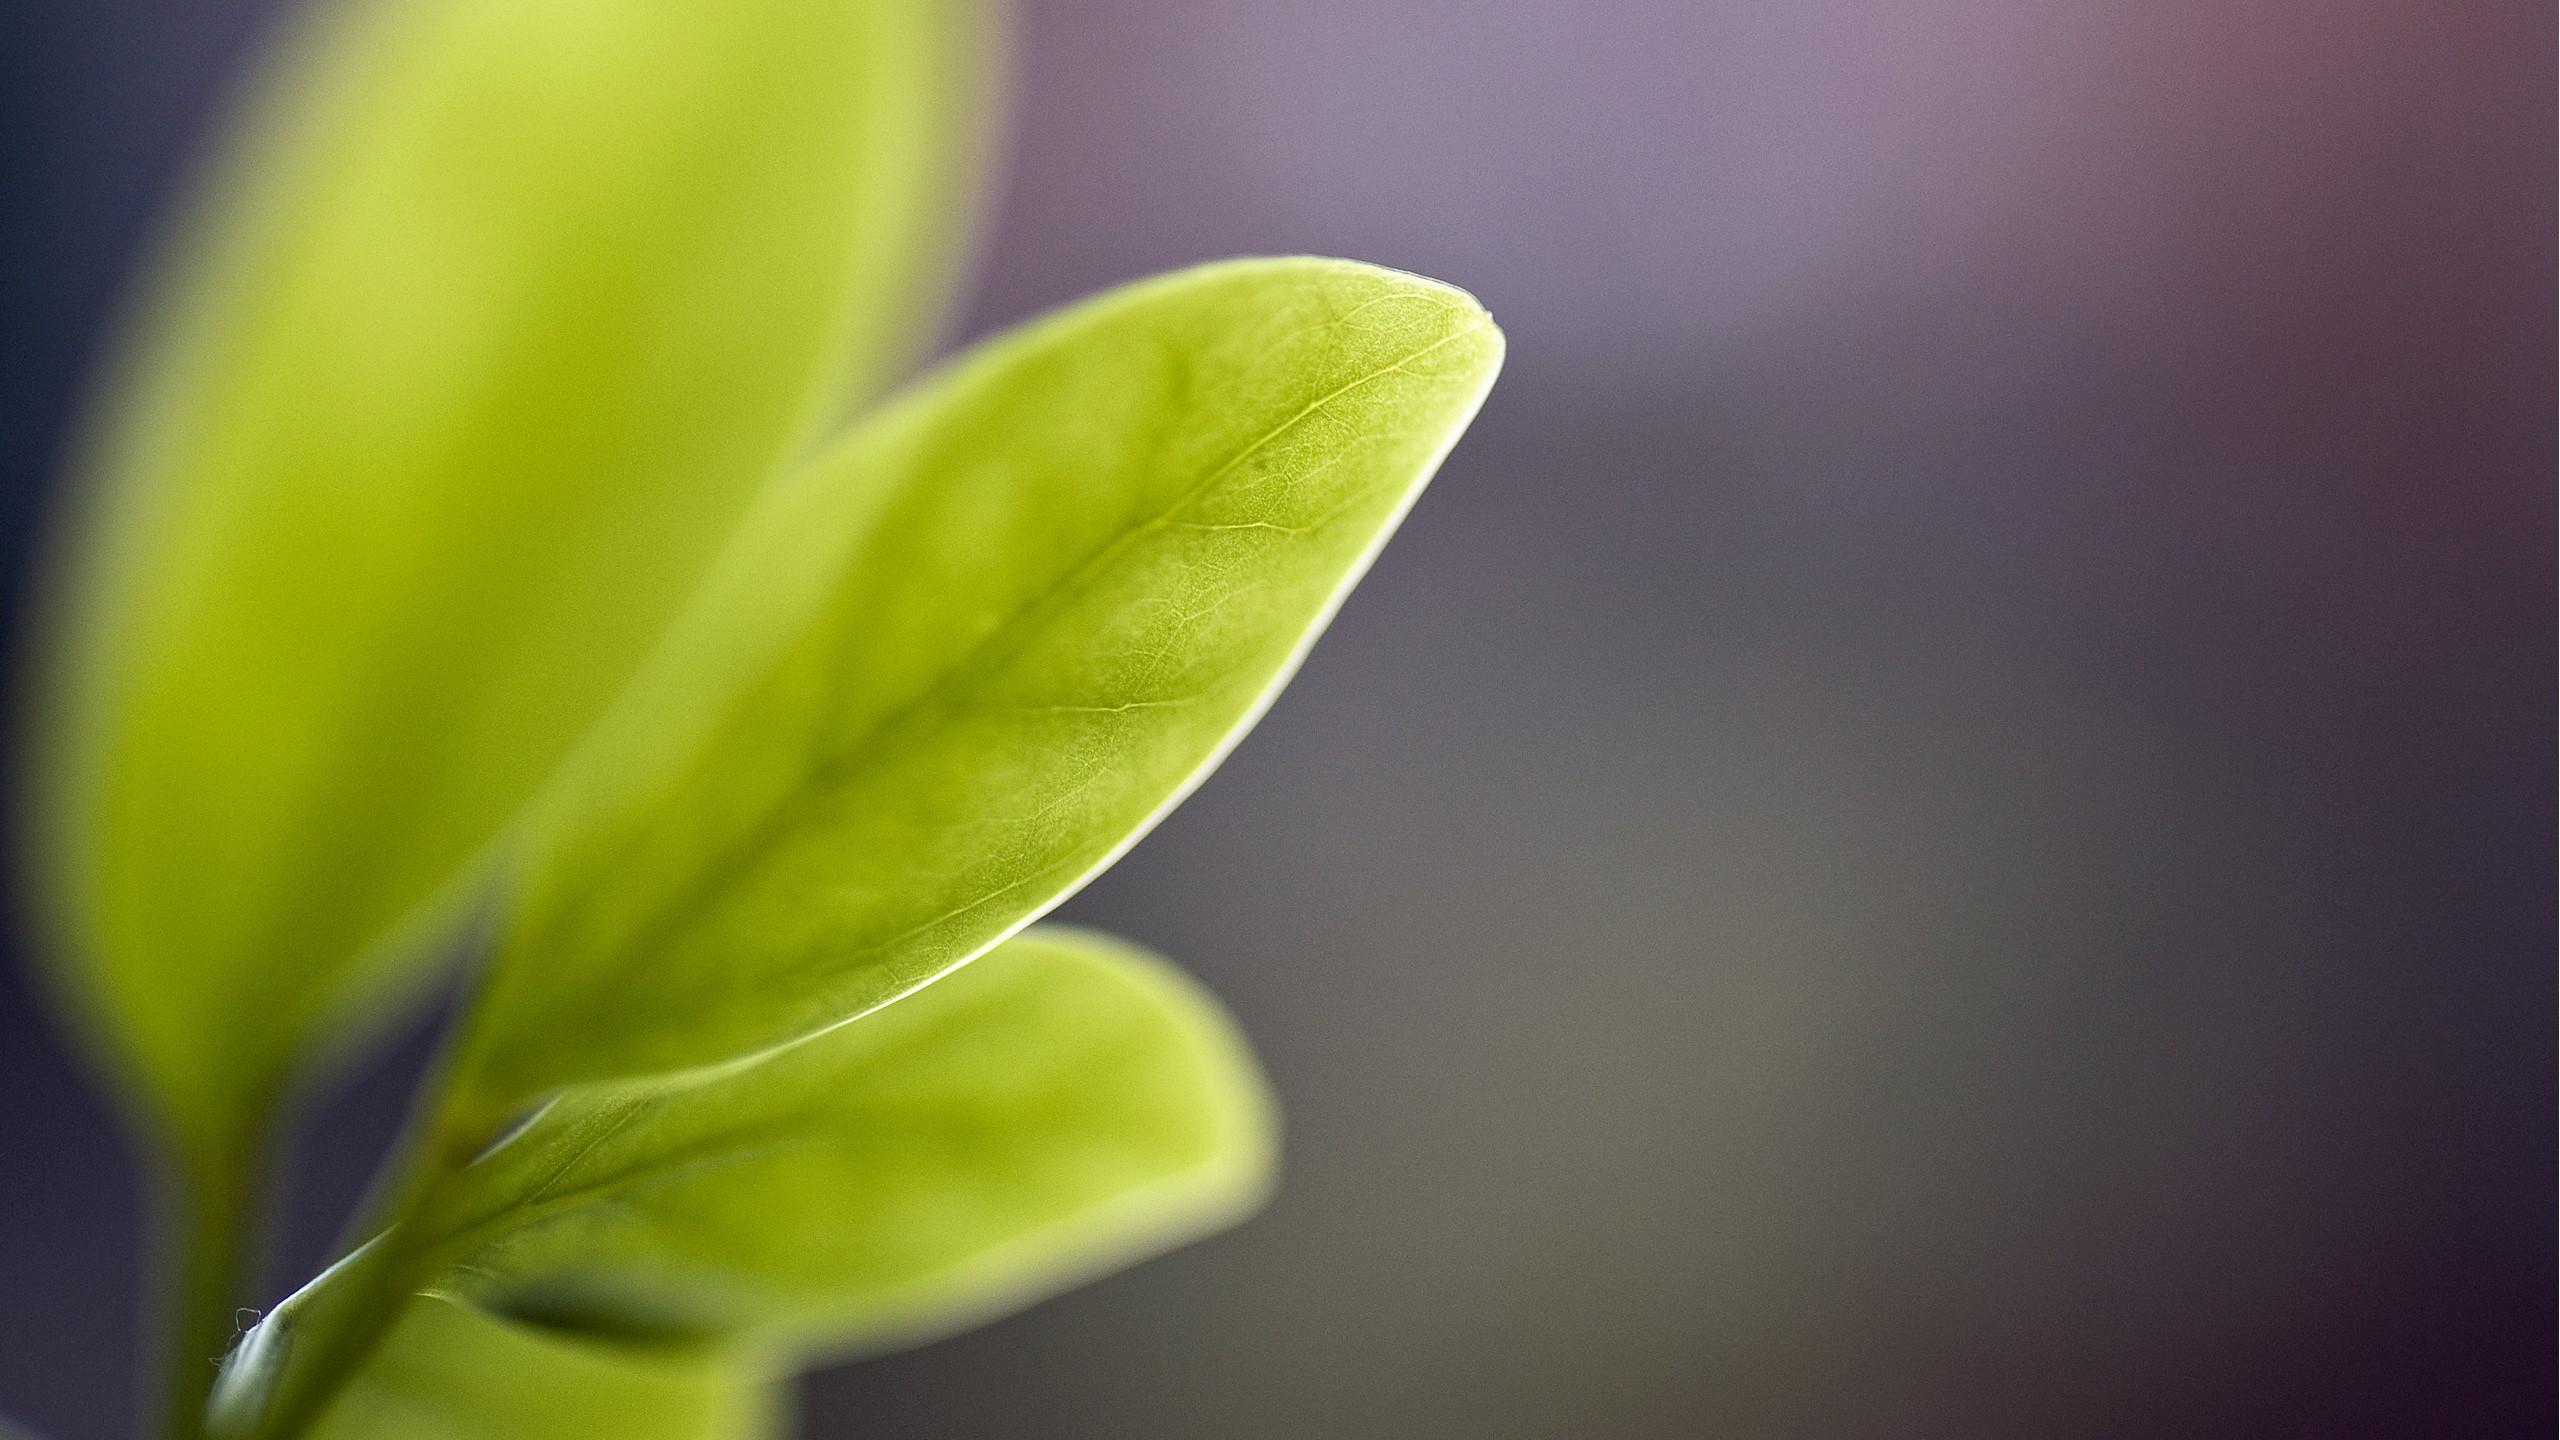 Cute Morning Hd Wallpaper Green Leaves Blur Wallpapers Hd Wallpapers Id 16678